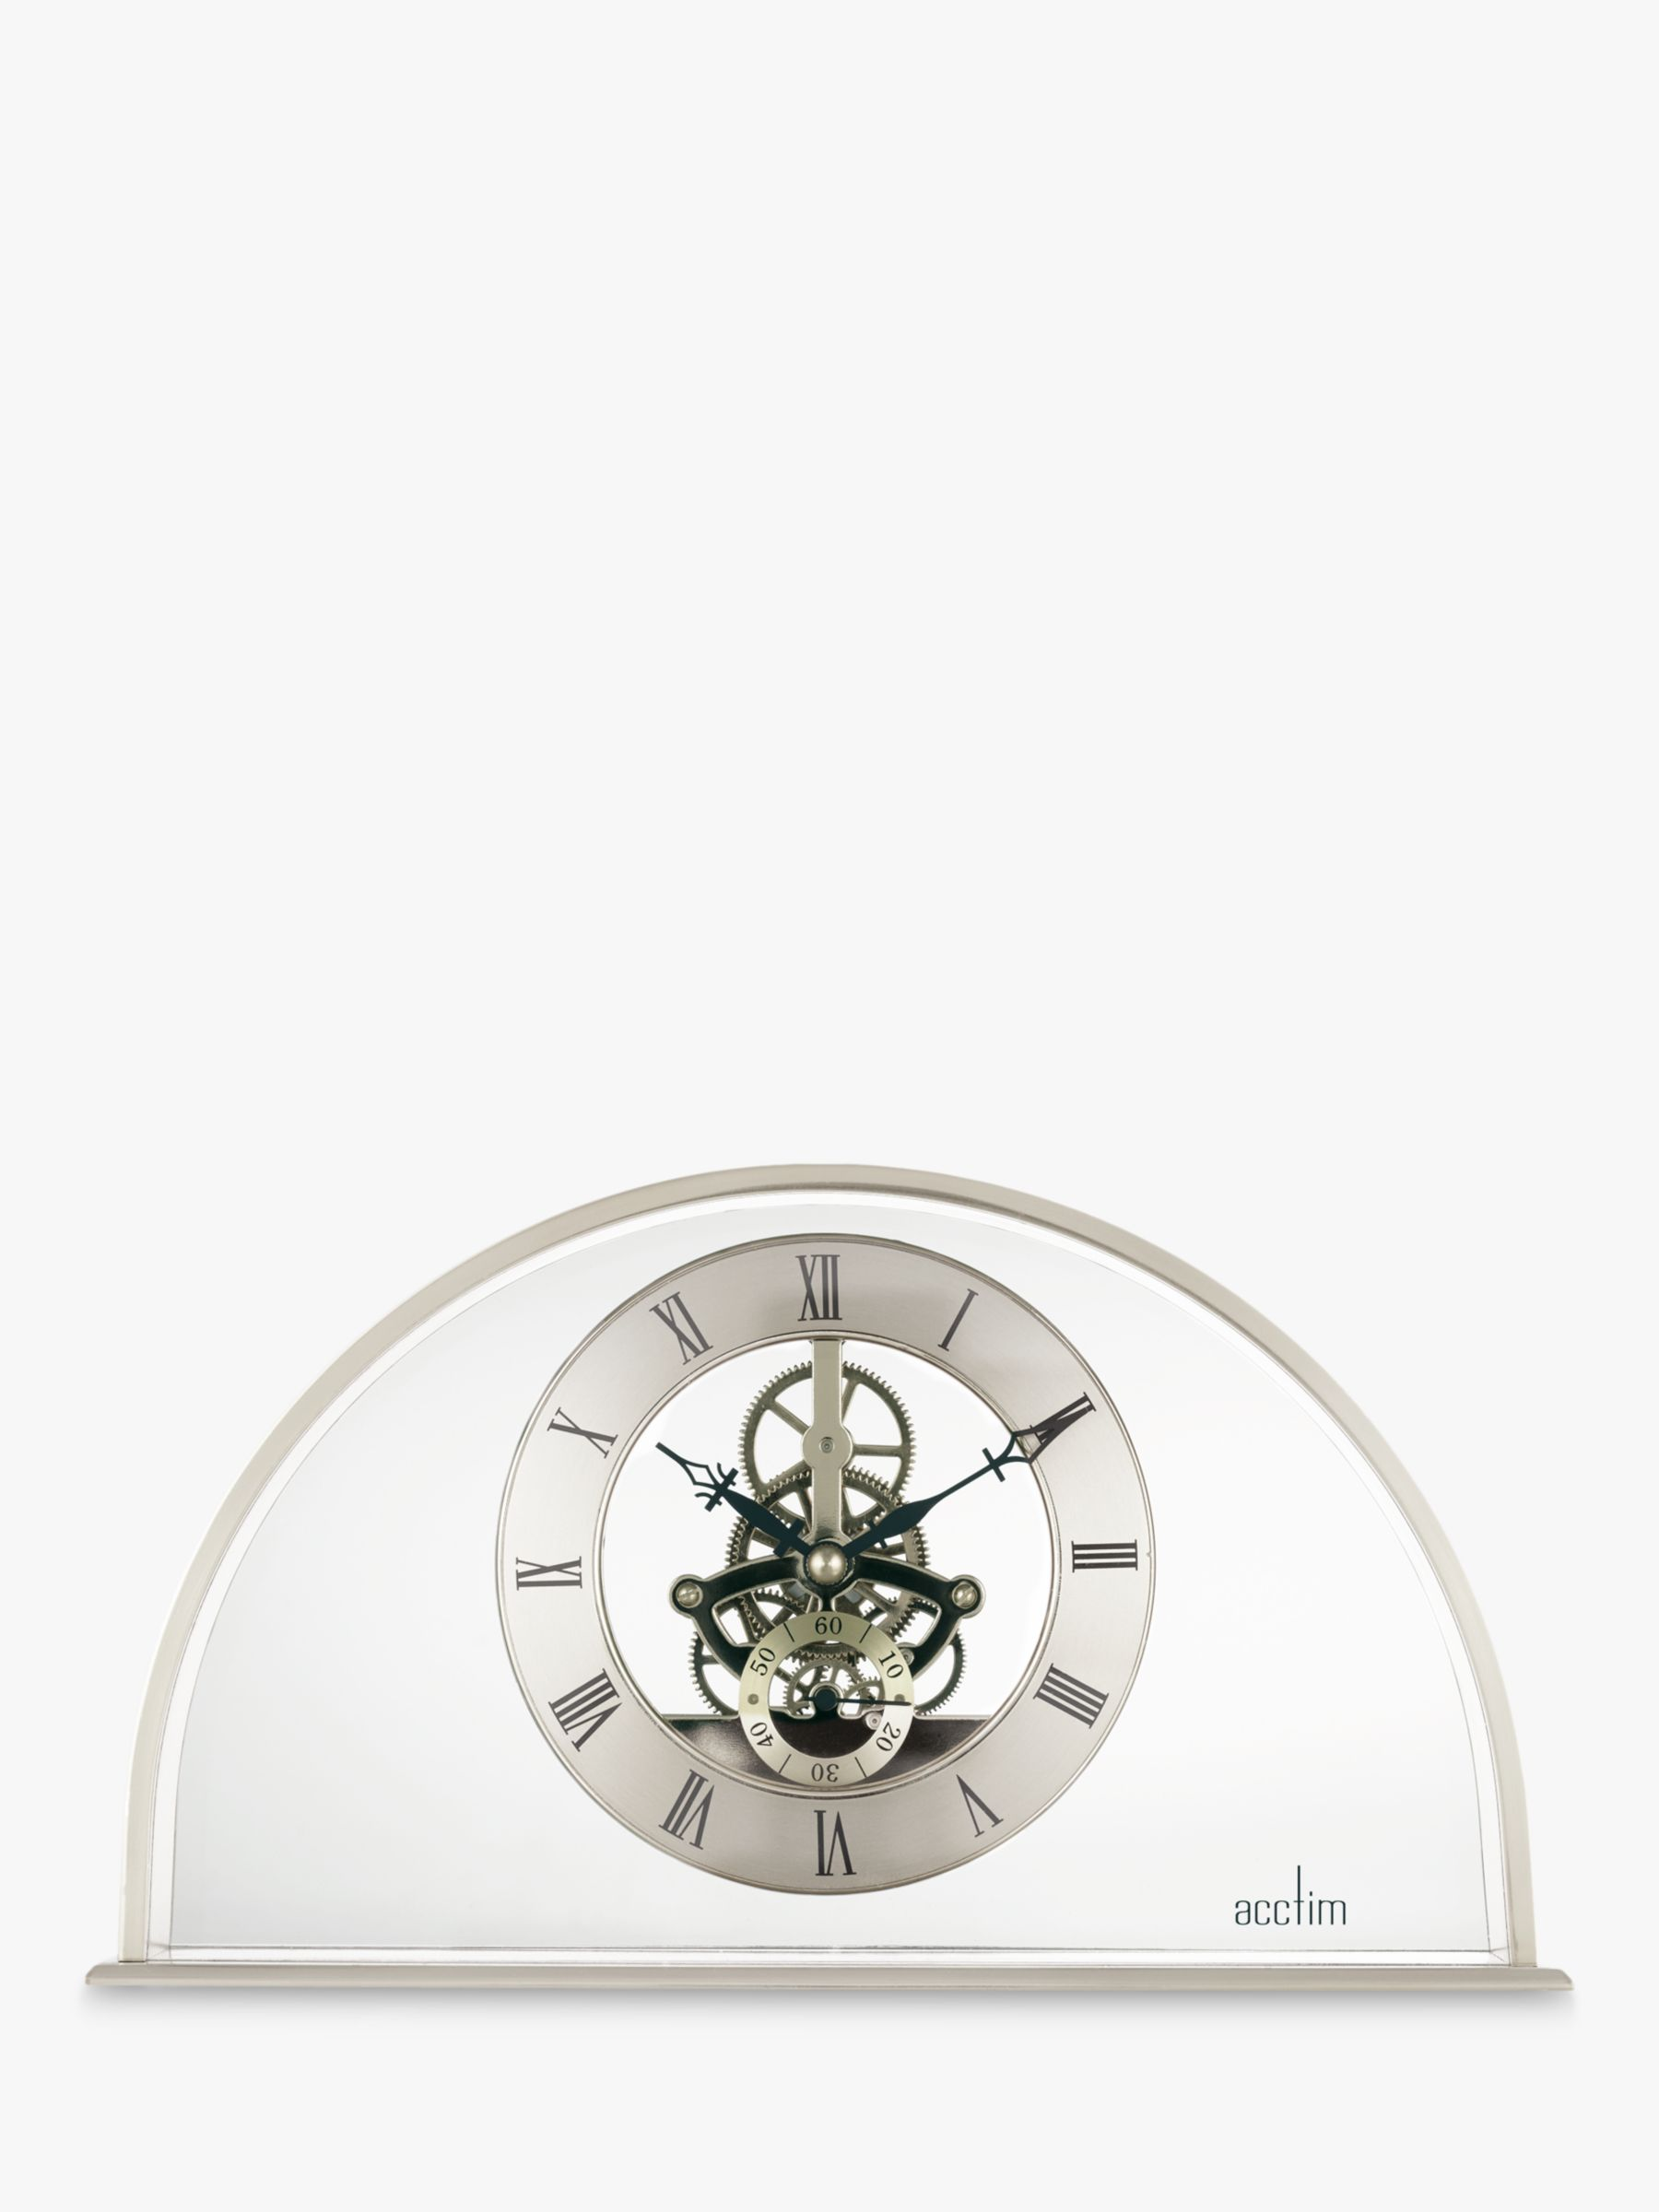 Acctim Acctim Hughenden Skeleton Mantel Clock, W24cm, Silver